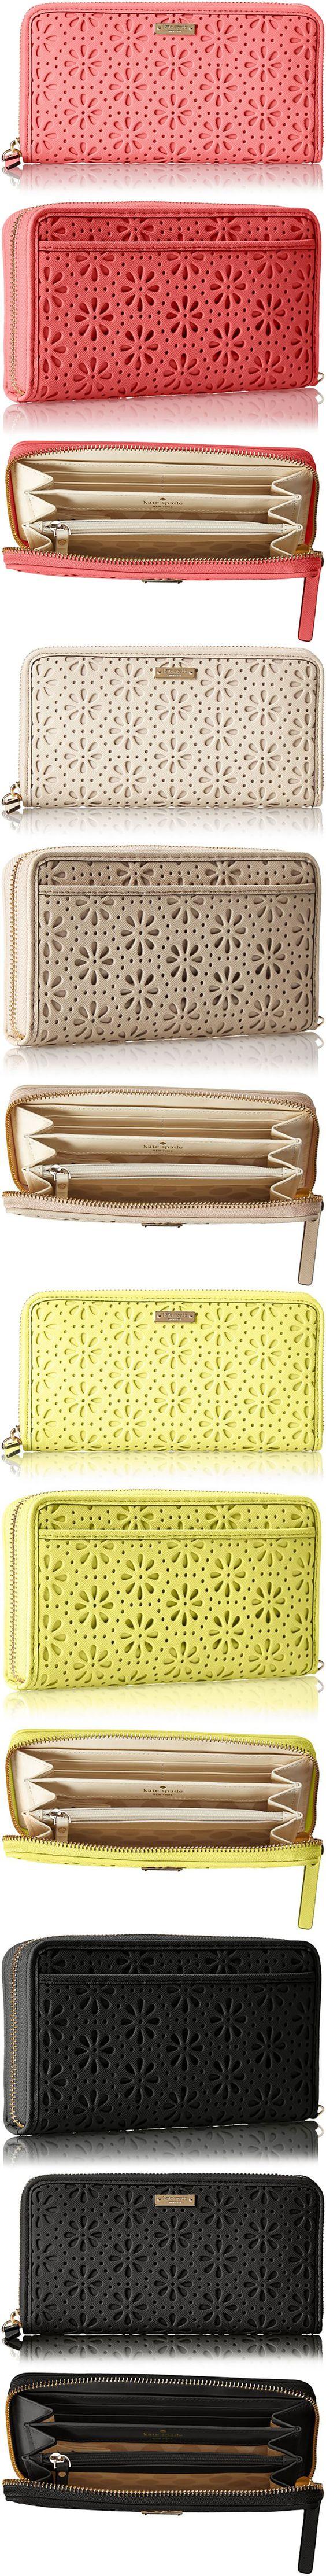 chloe handbags fake - Kate Spade Purse #Kate #Spade #Purse, Wholesale Kate Spade Bags ...